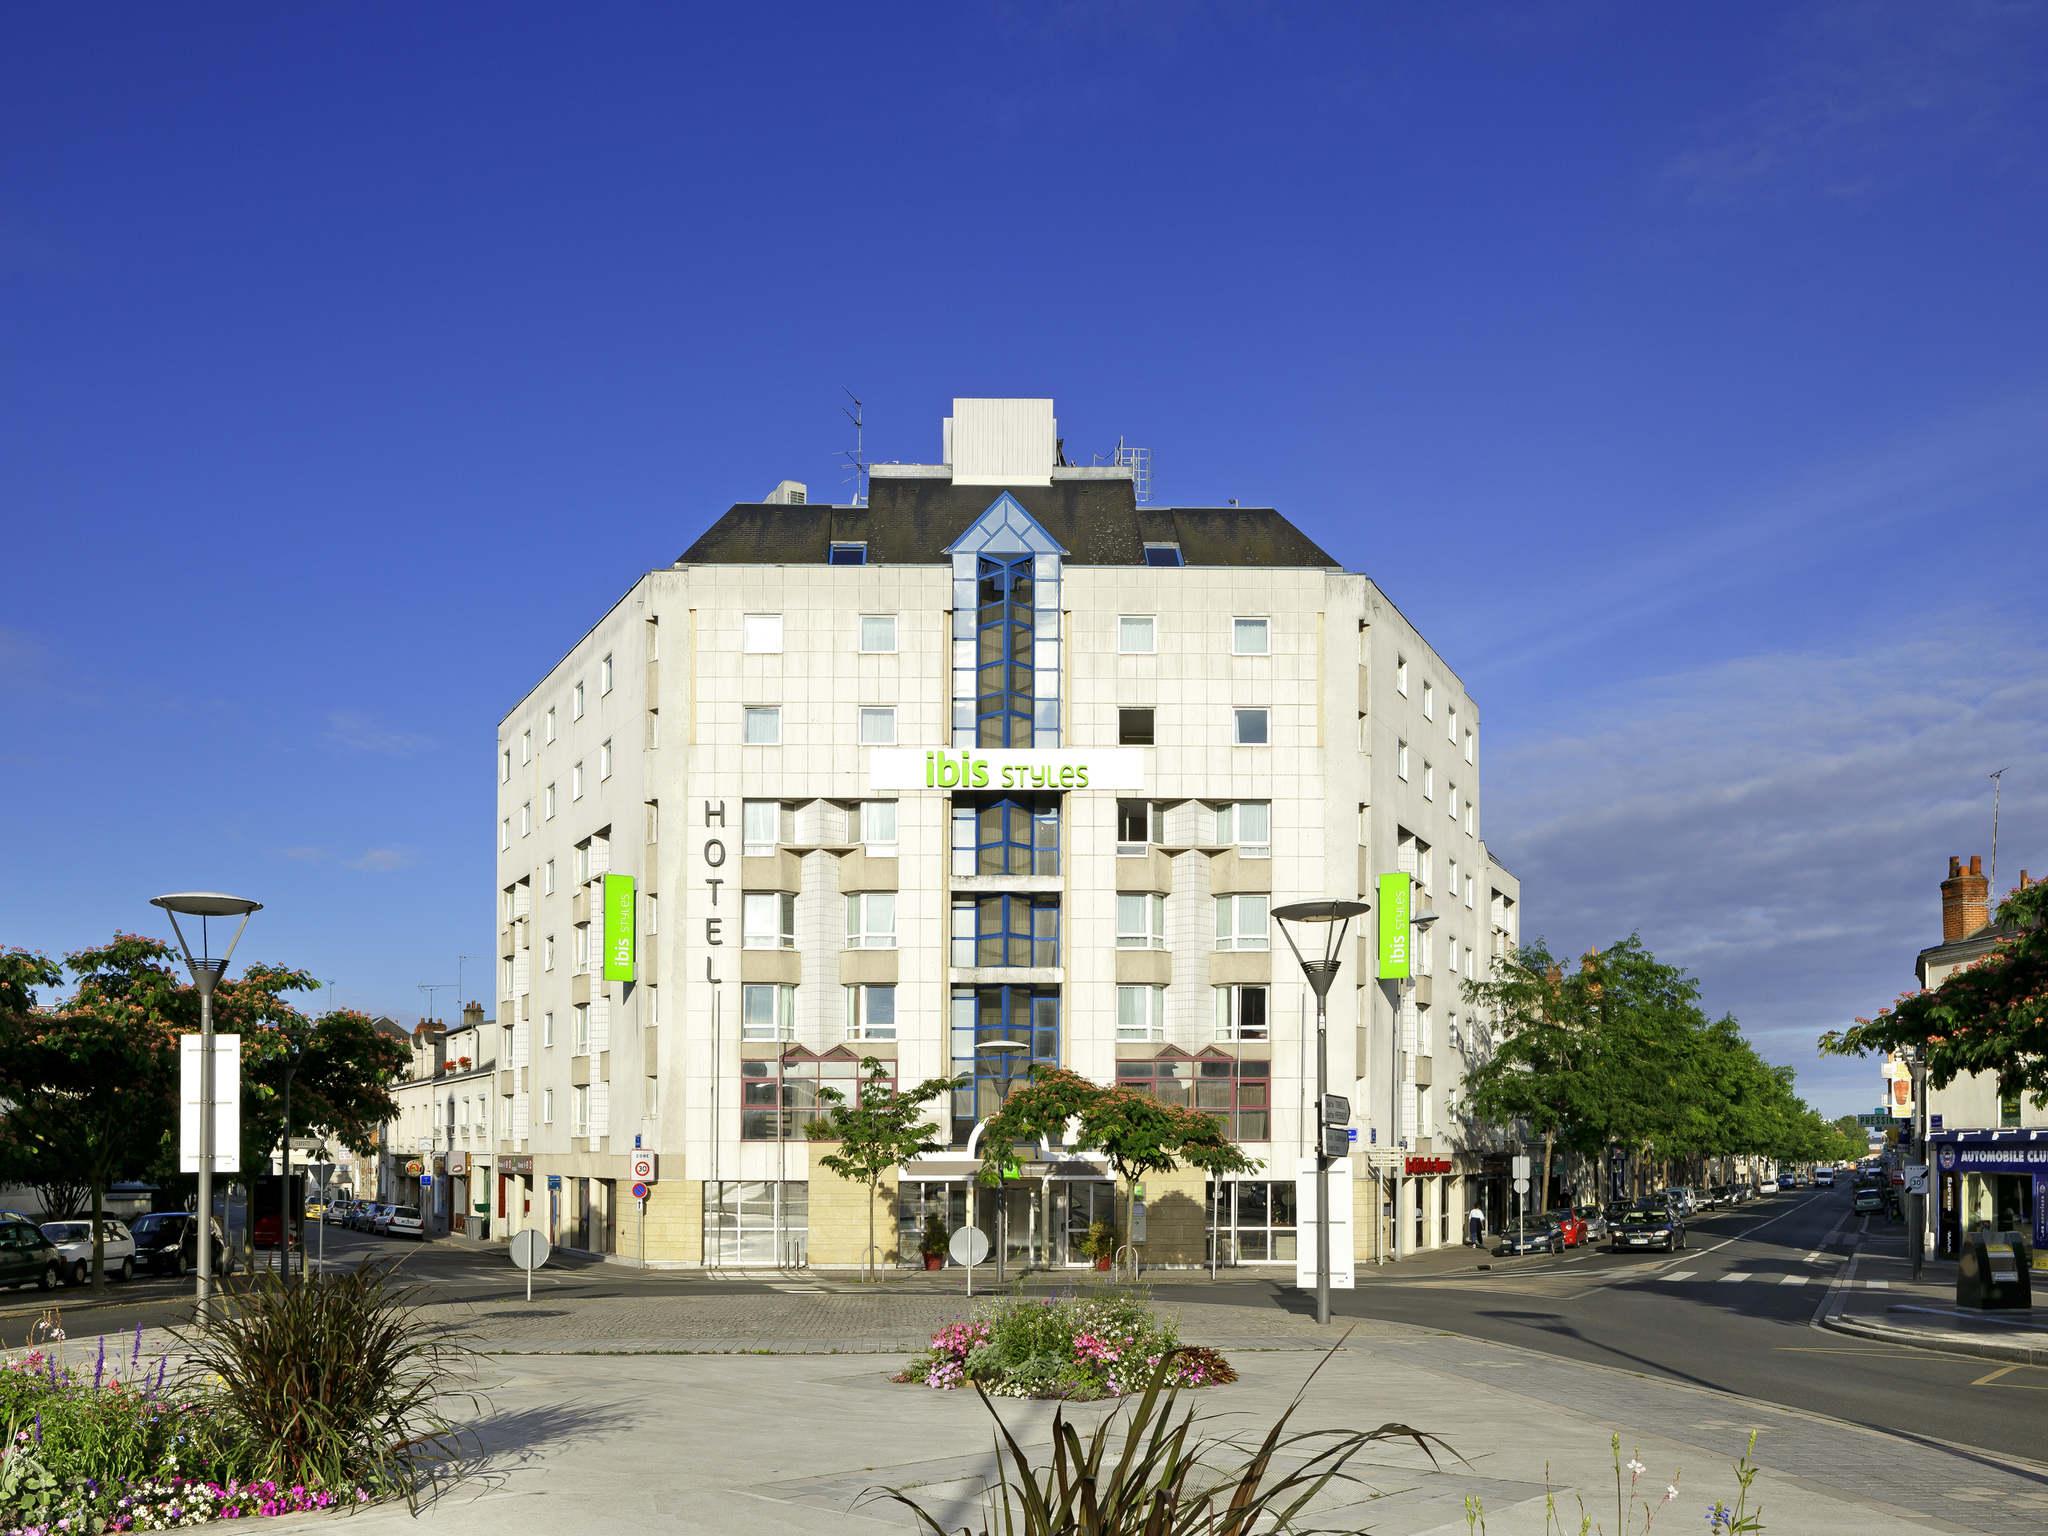 Hotel Ibis Styles Tours Centre